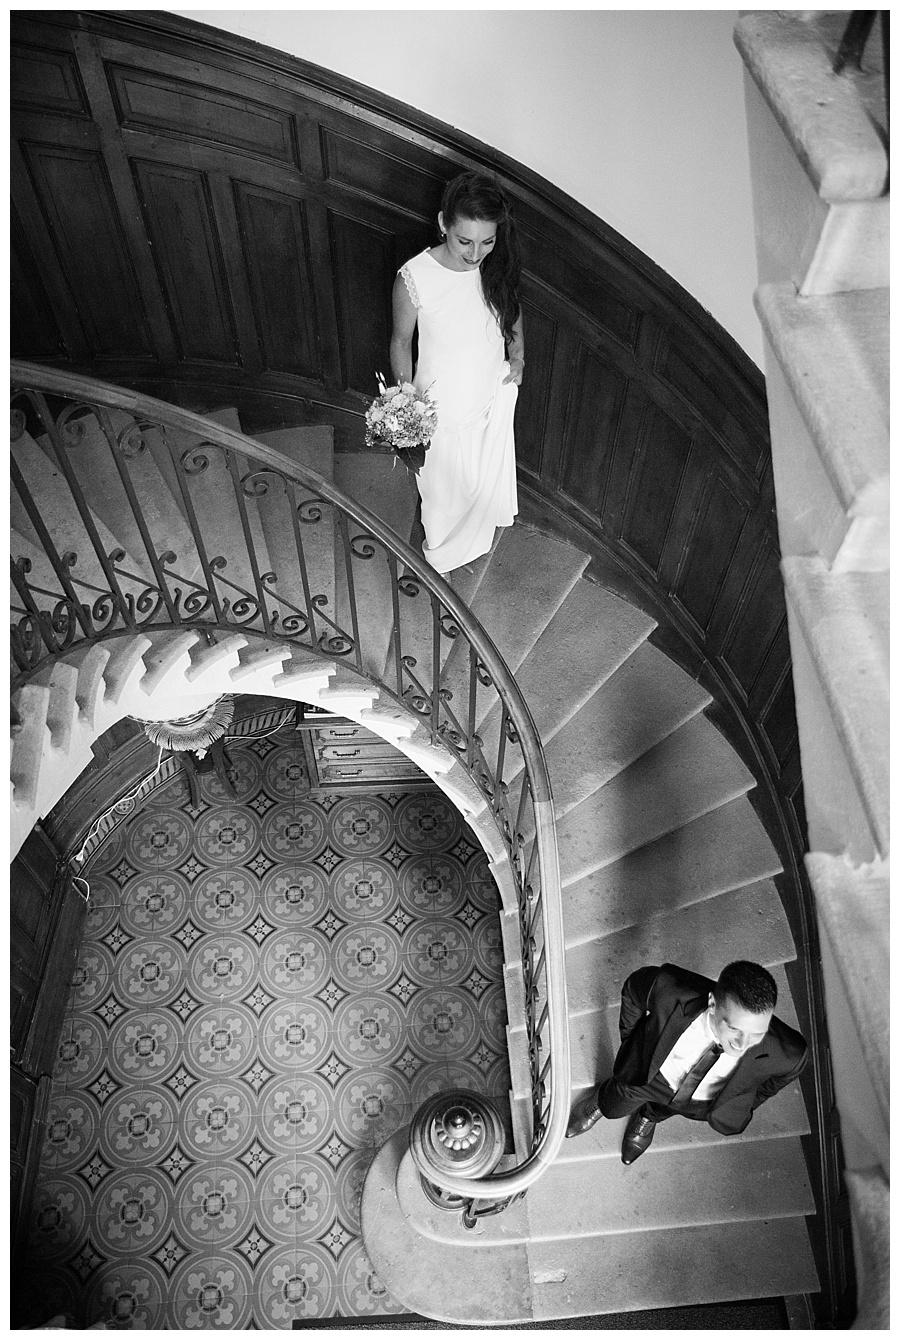 photographe-mariage-toulouse-anais-bertrand-mariage-tea-time-chateau-Lastours-la-rencontre